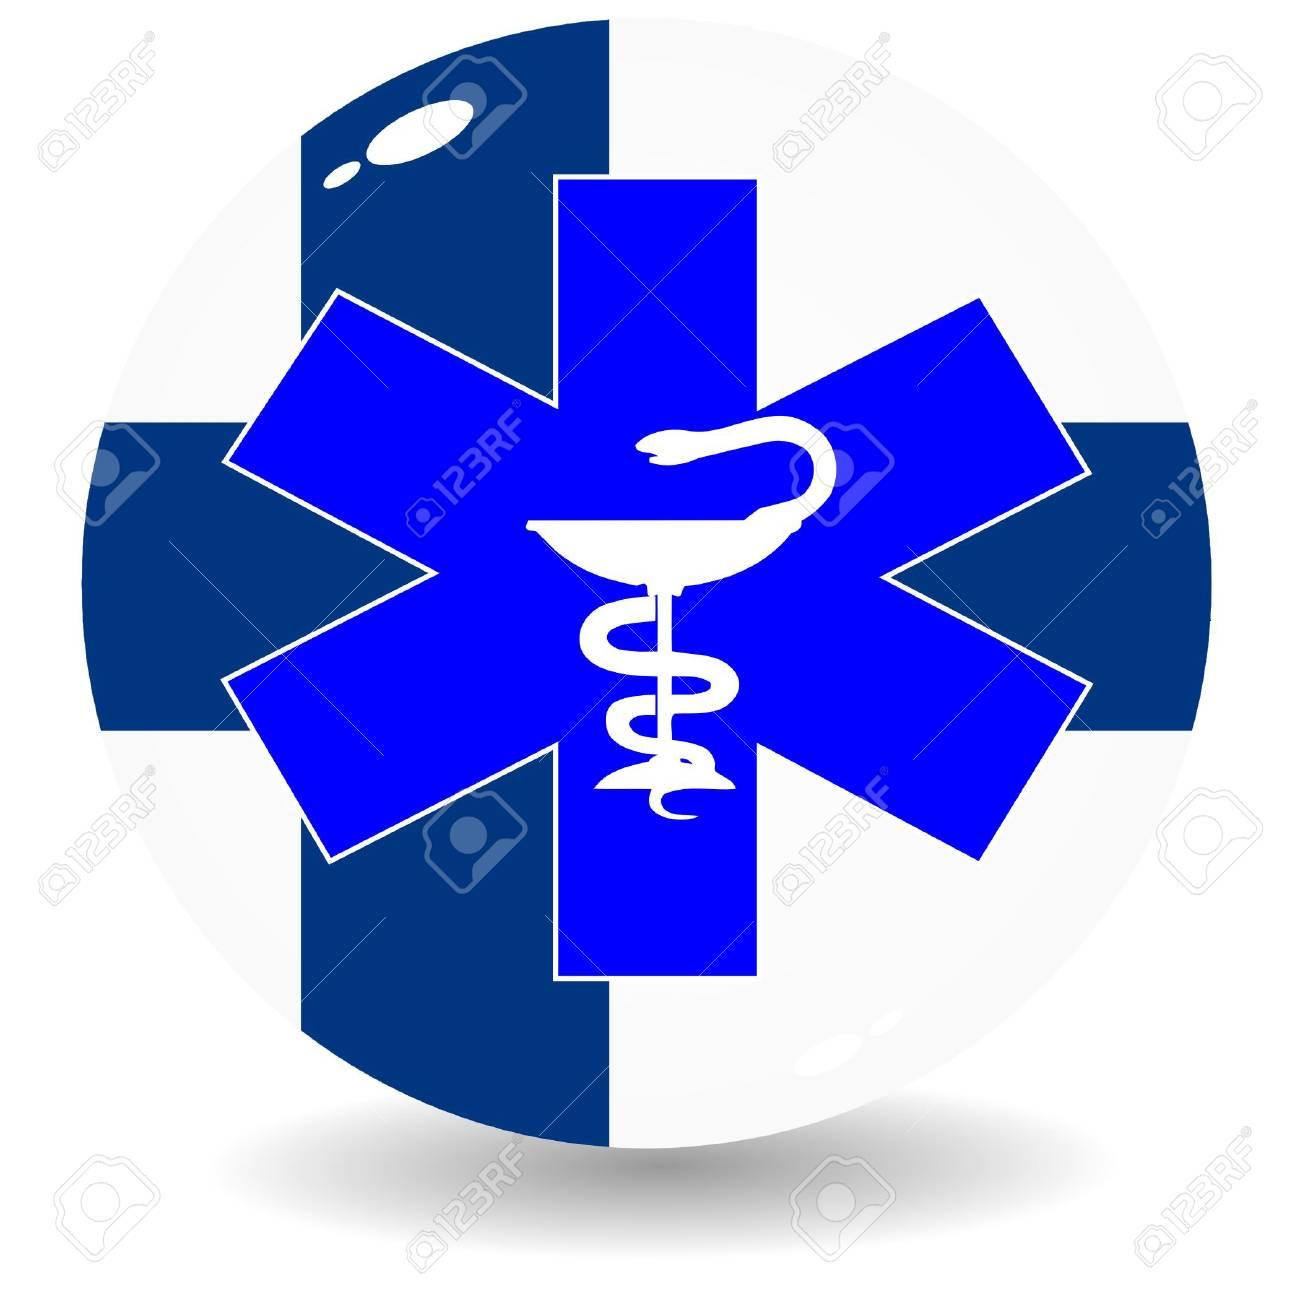 National Health Finland Stock Vector - 11908340